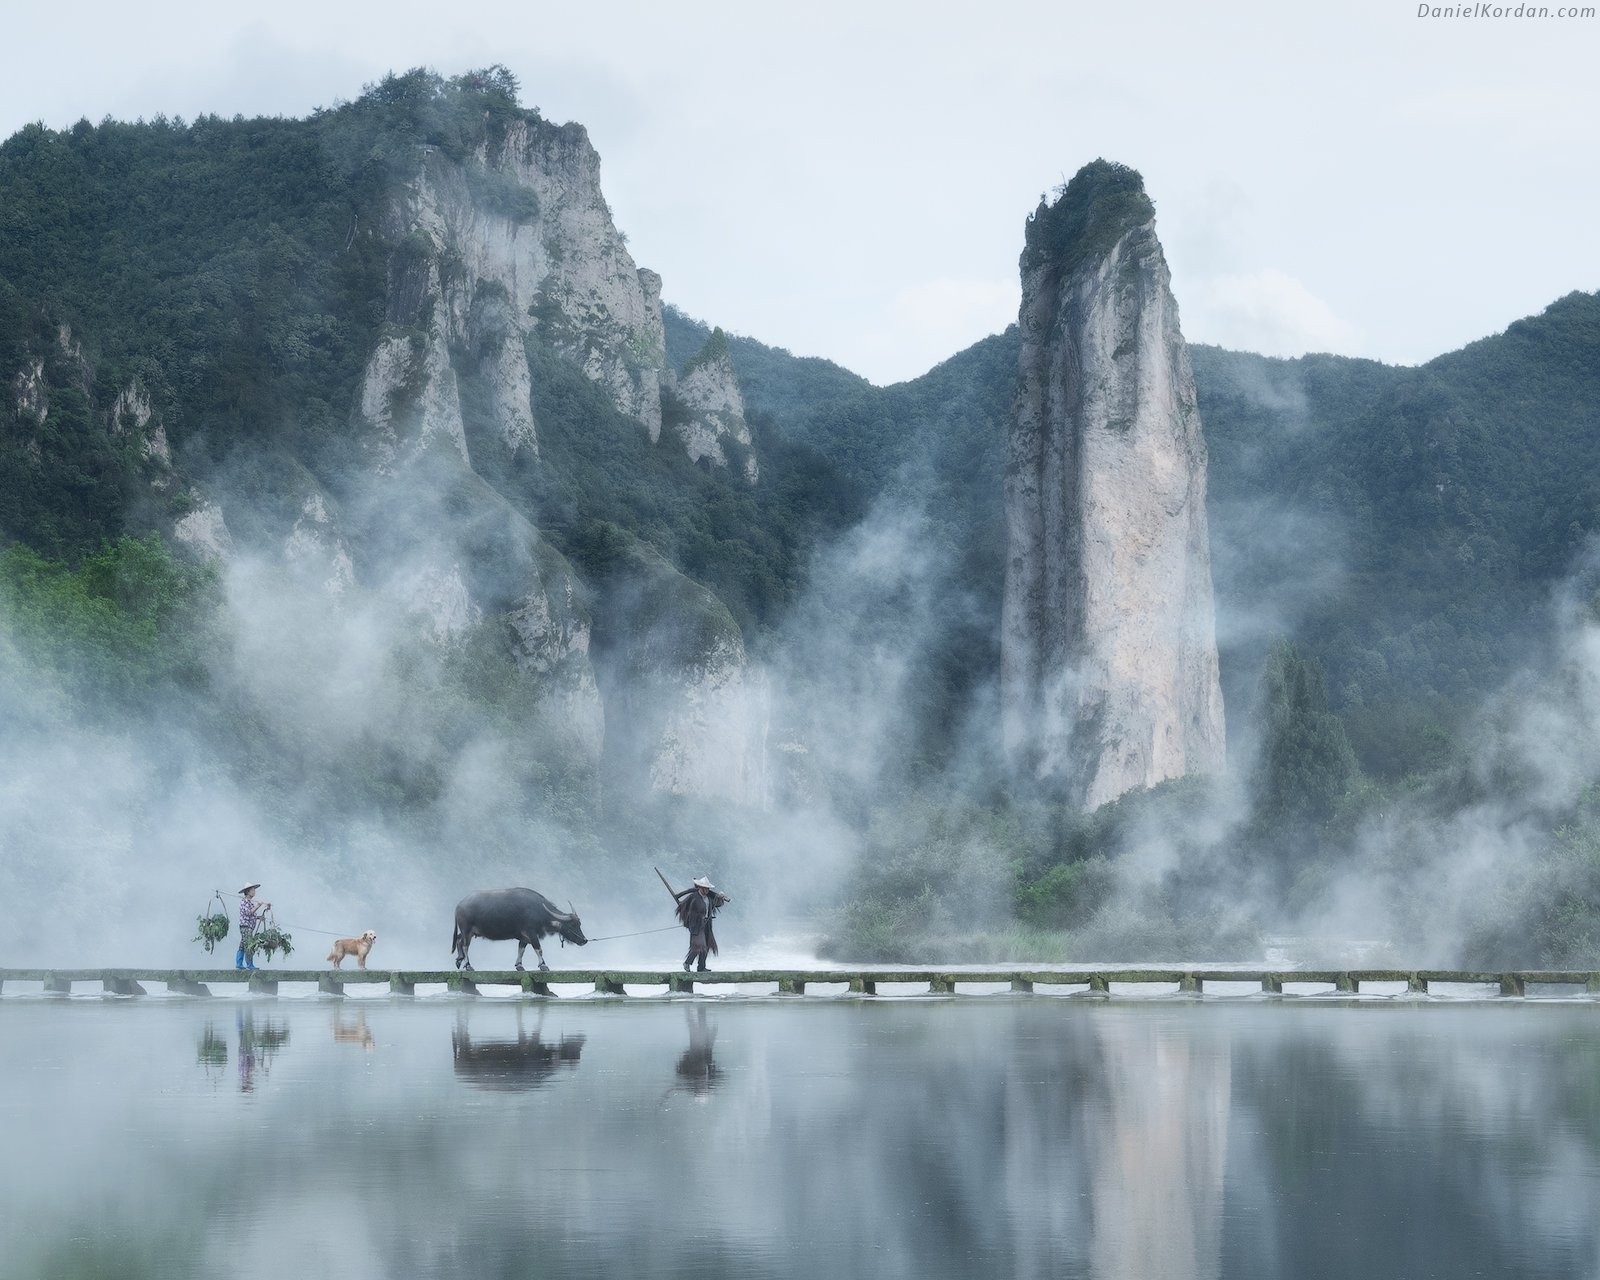 Китай, Даниил Коржонов